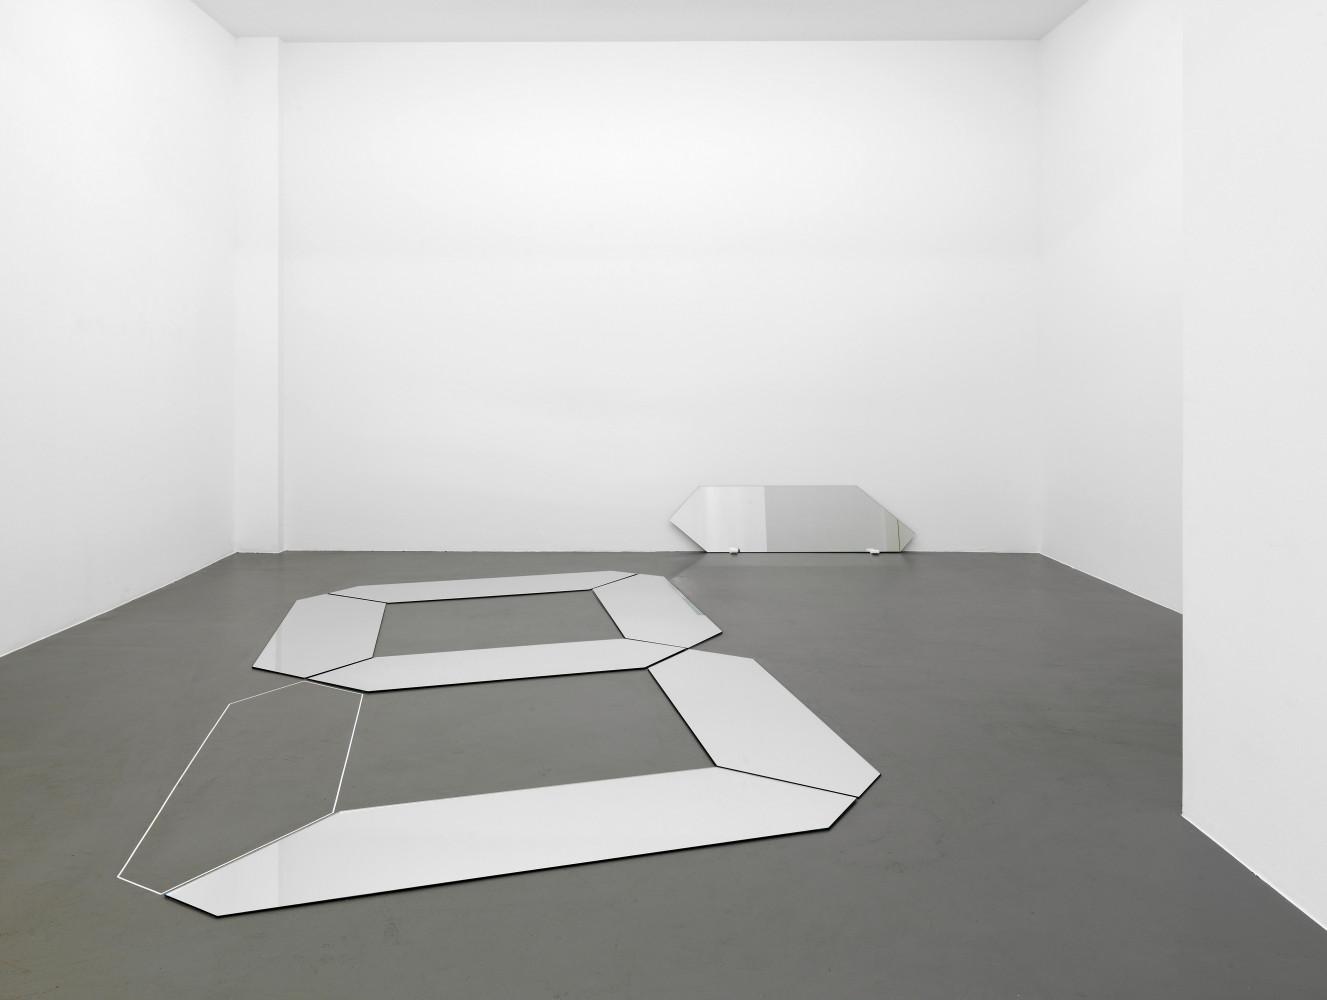 Tatsuo Miyajima, 'Counter Sculpture', 2000